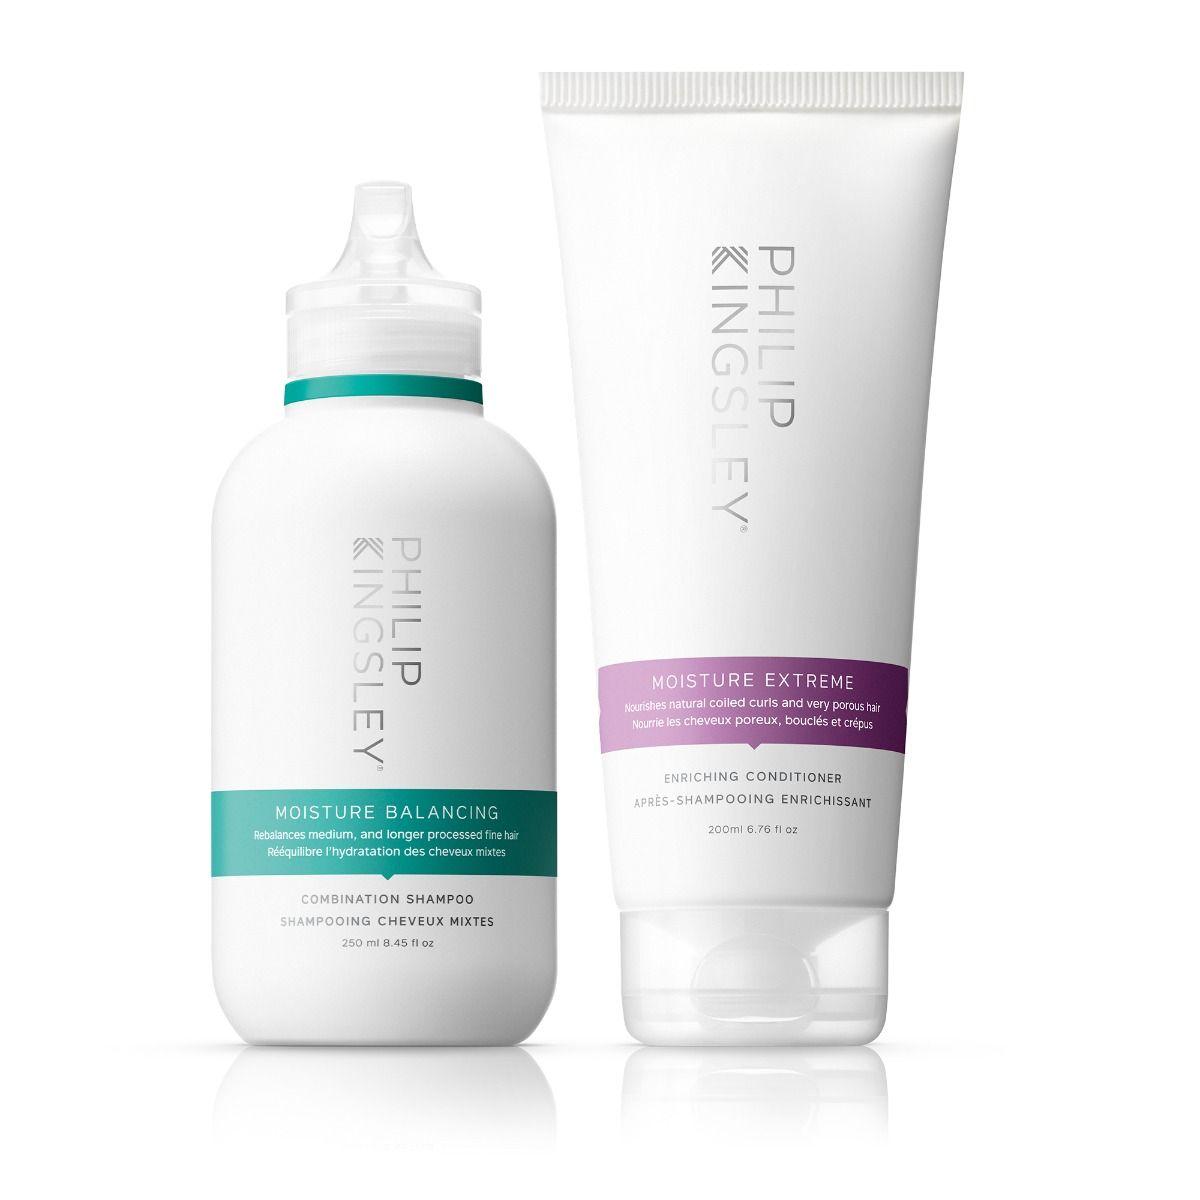 Moisture Balancing Combination Shampoo & Moisture Extreme Enriching Conditioner Duo